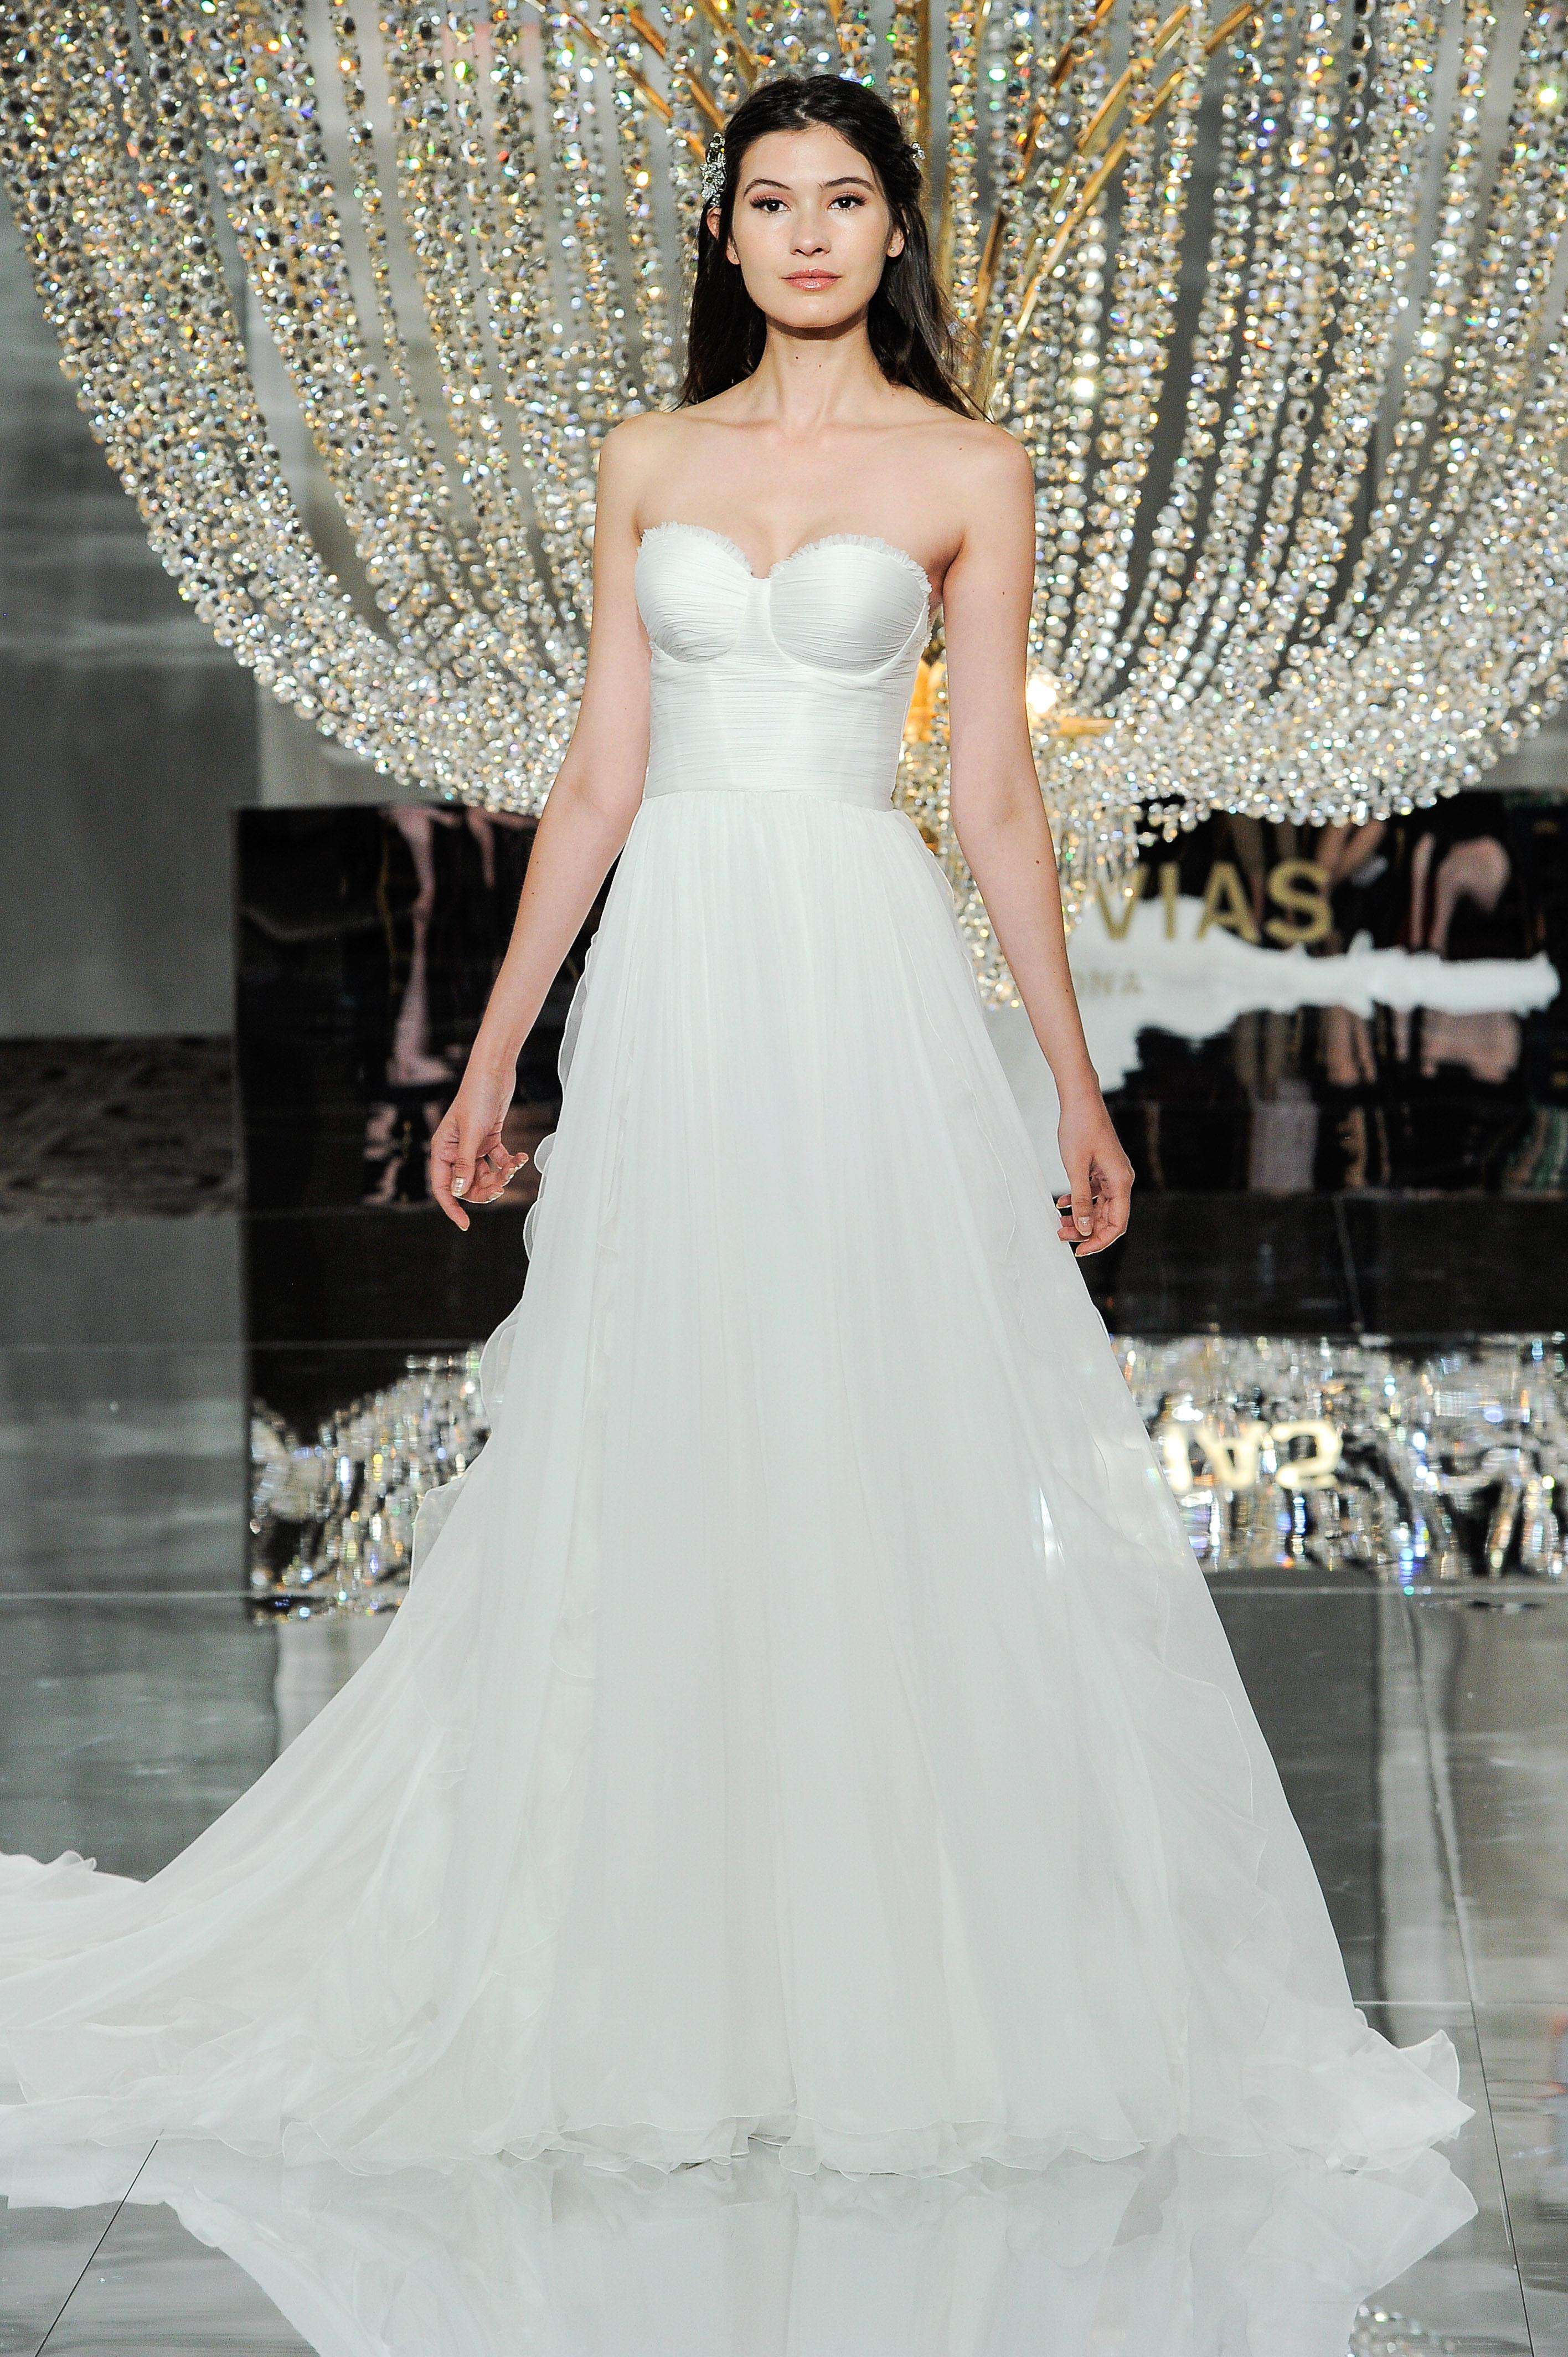 pronovias wedding dress fall 2018 sweetheart strapless a-line